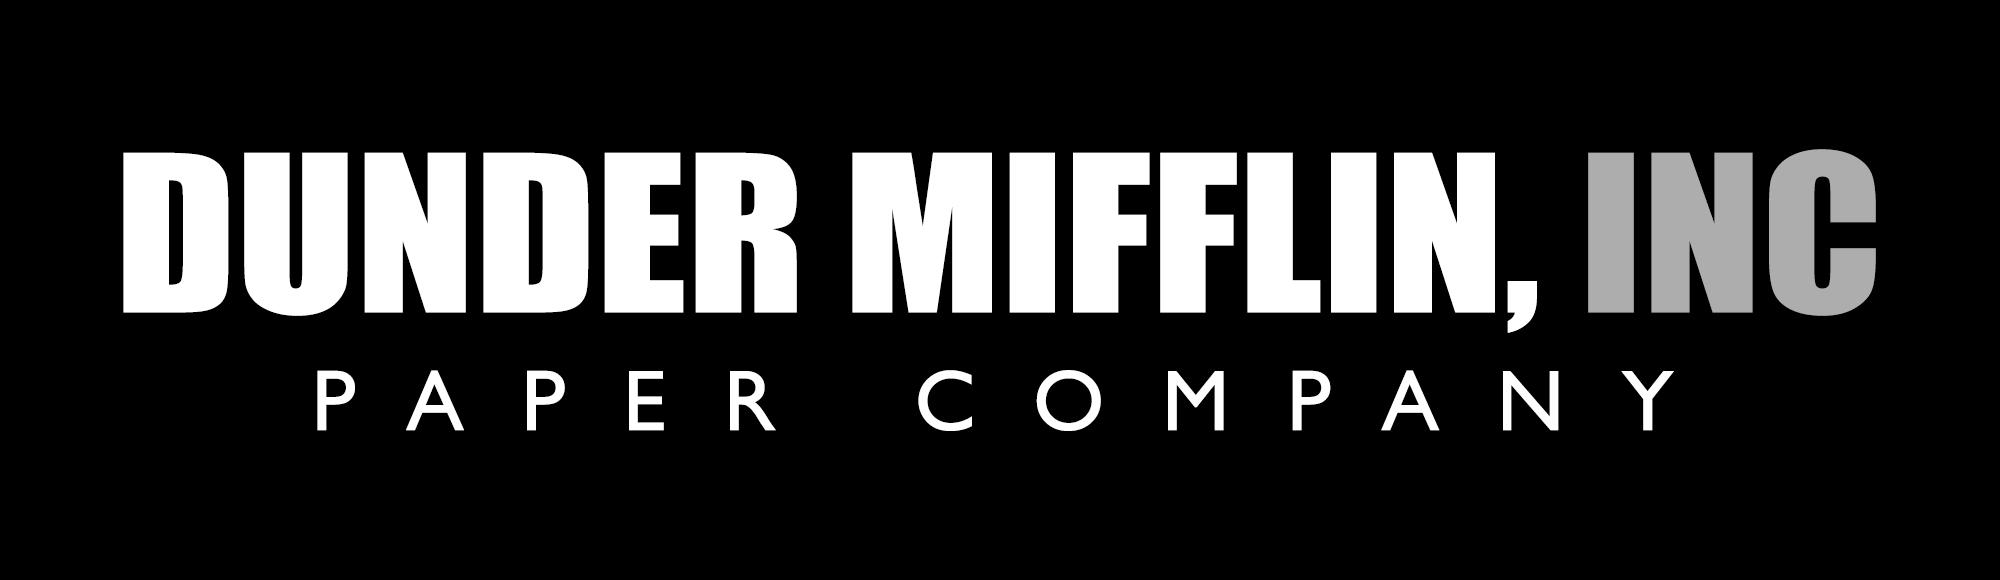 Dunder Mifflin Paper Company